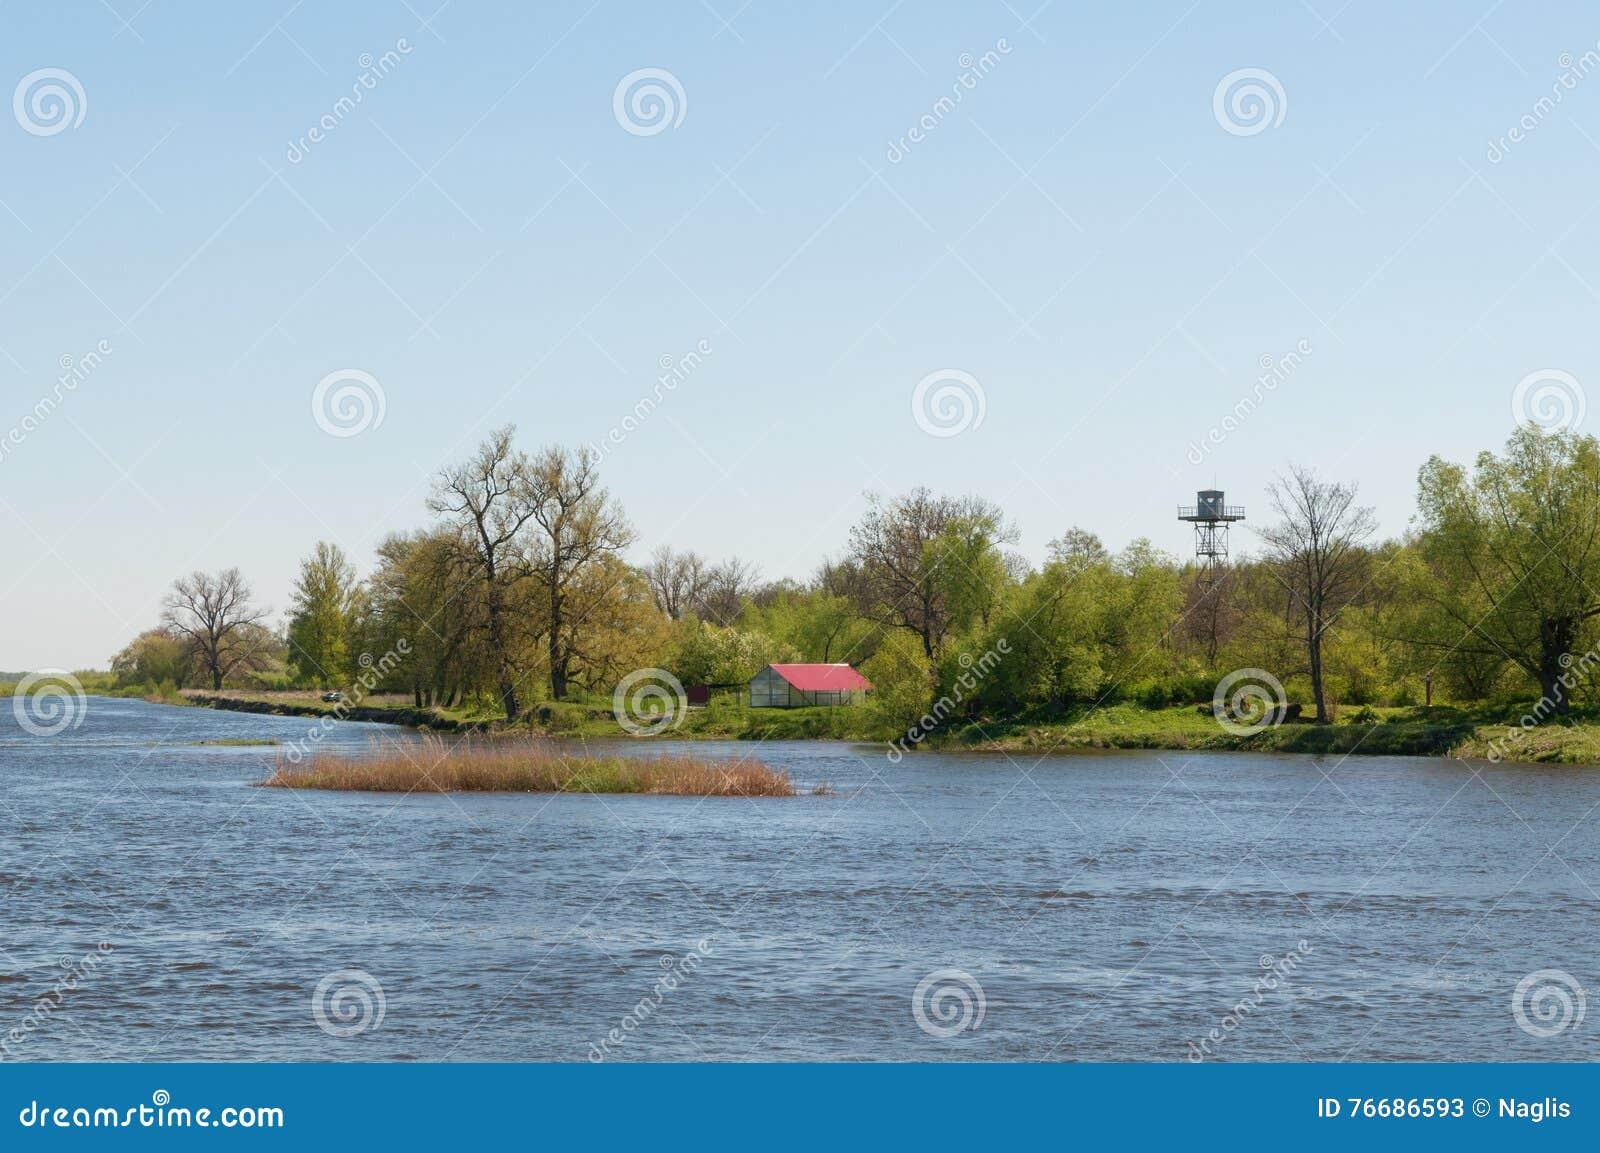 Russian Federation shore